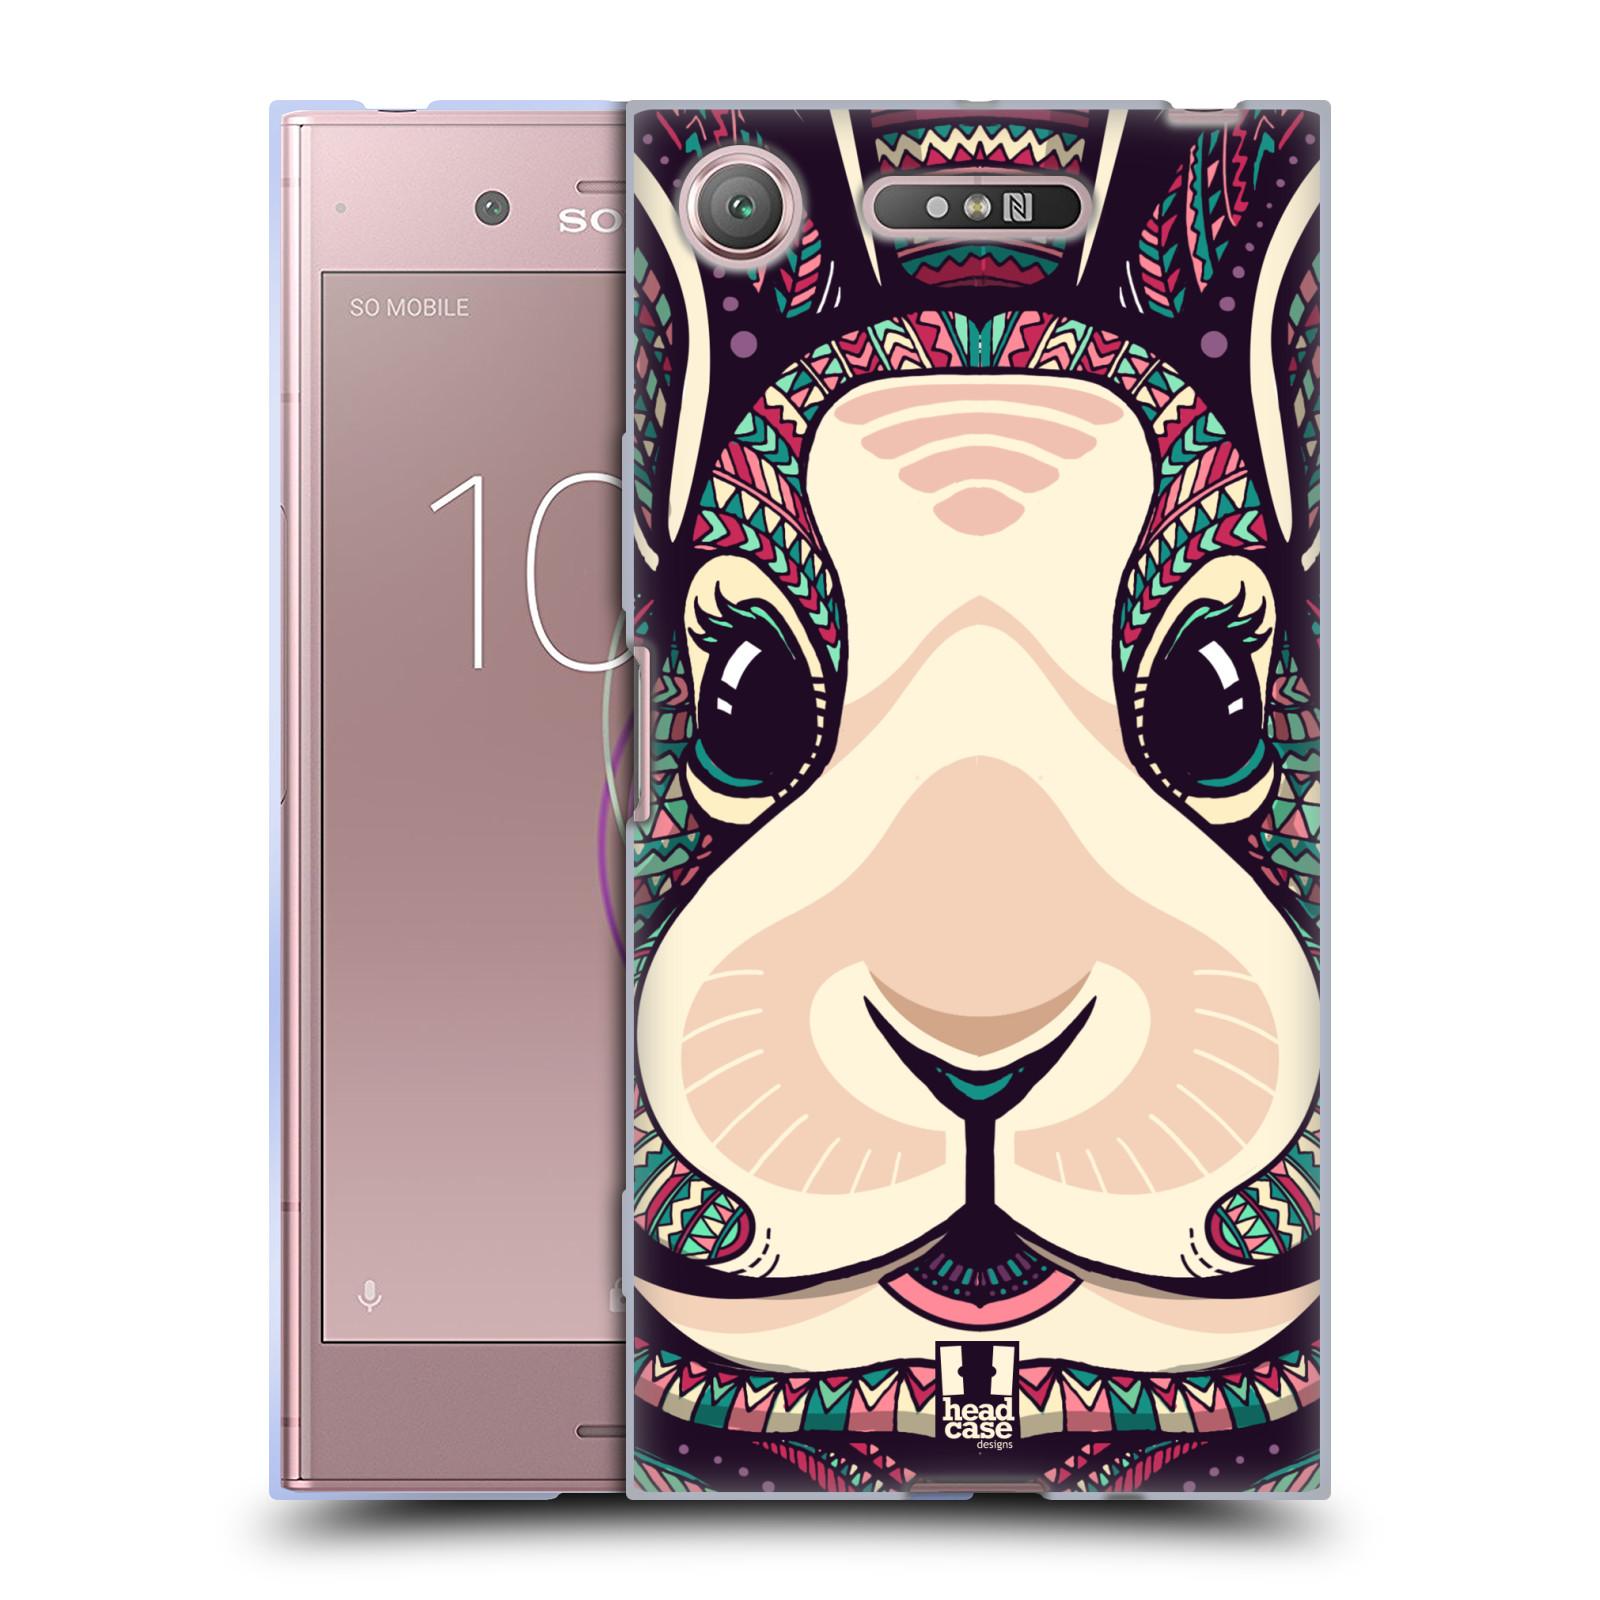 Silikonové pouzdro na mobil Sony Xperia XZ1 - Head Case - AZTEC ZAJÍČEK